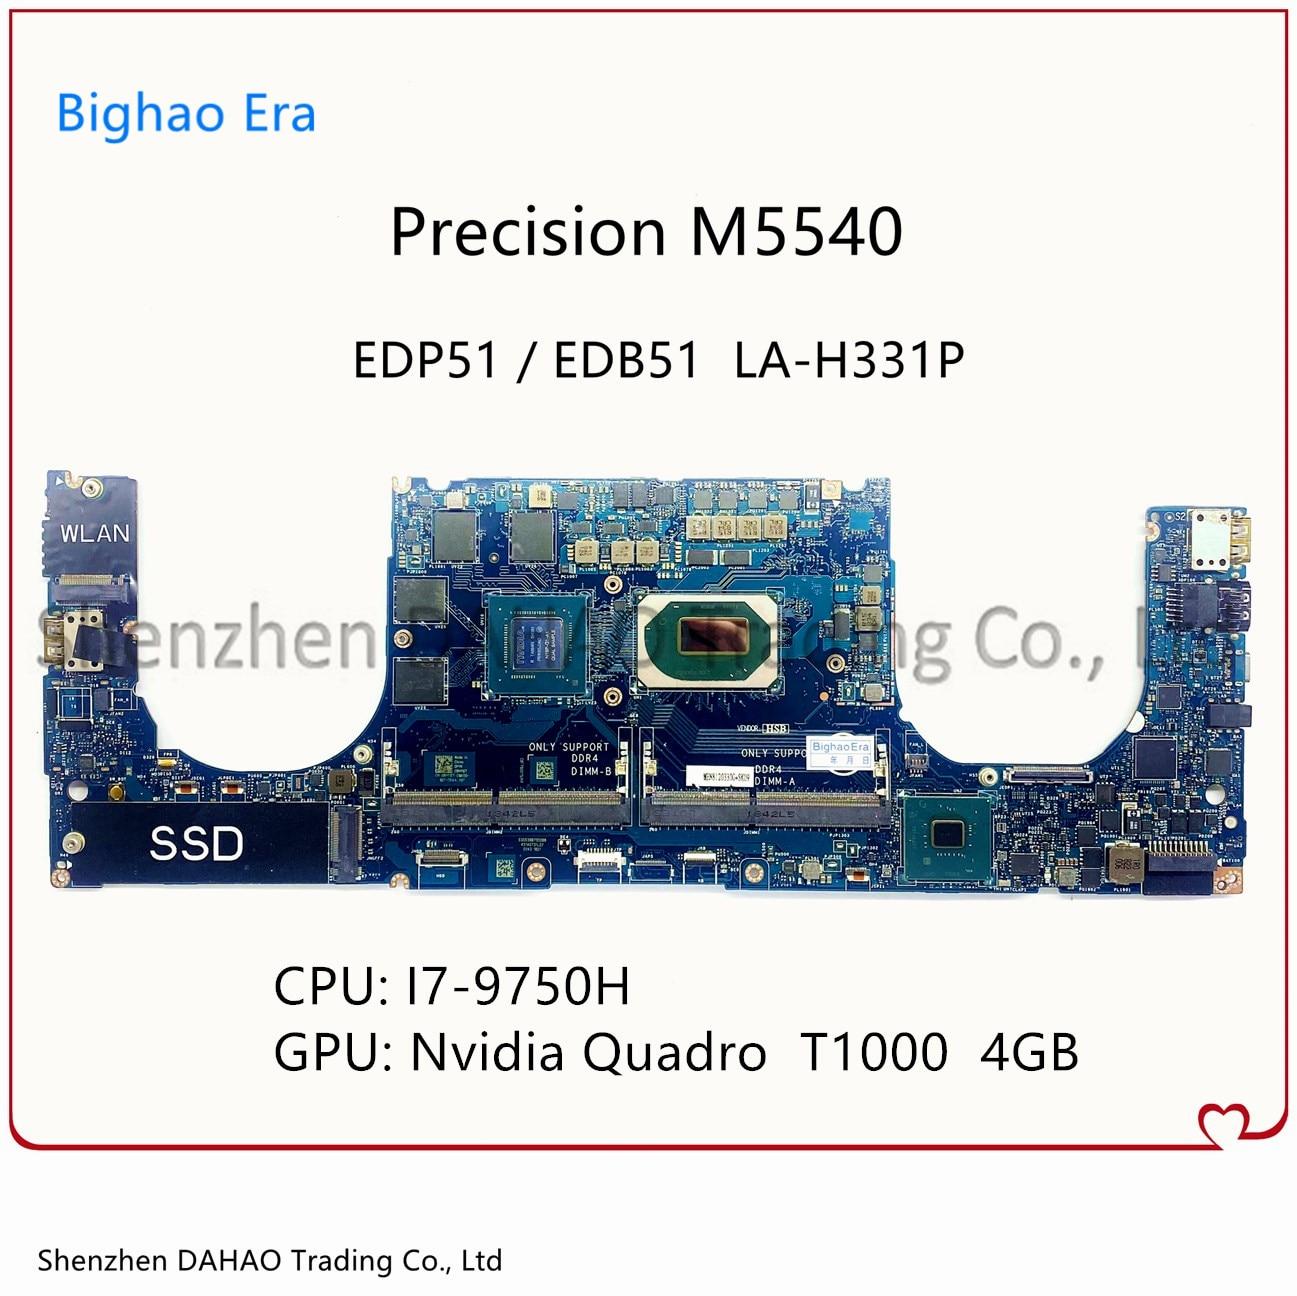 CN-0GCN0K 0GCN0K لديل الدقة 5540 M5540 اللوحة المحمول EDP51 EDB51 LA-H331P مع i7-9750H T1000 4G-GPU 100% اختبار كامل